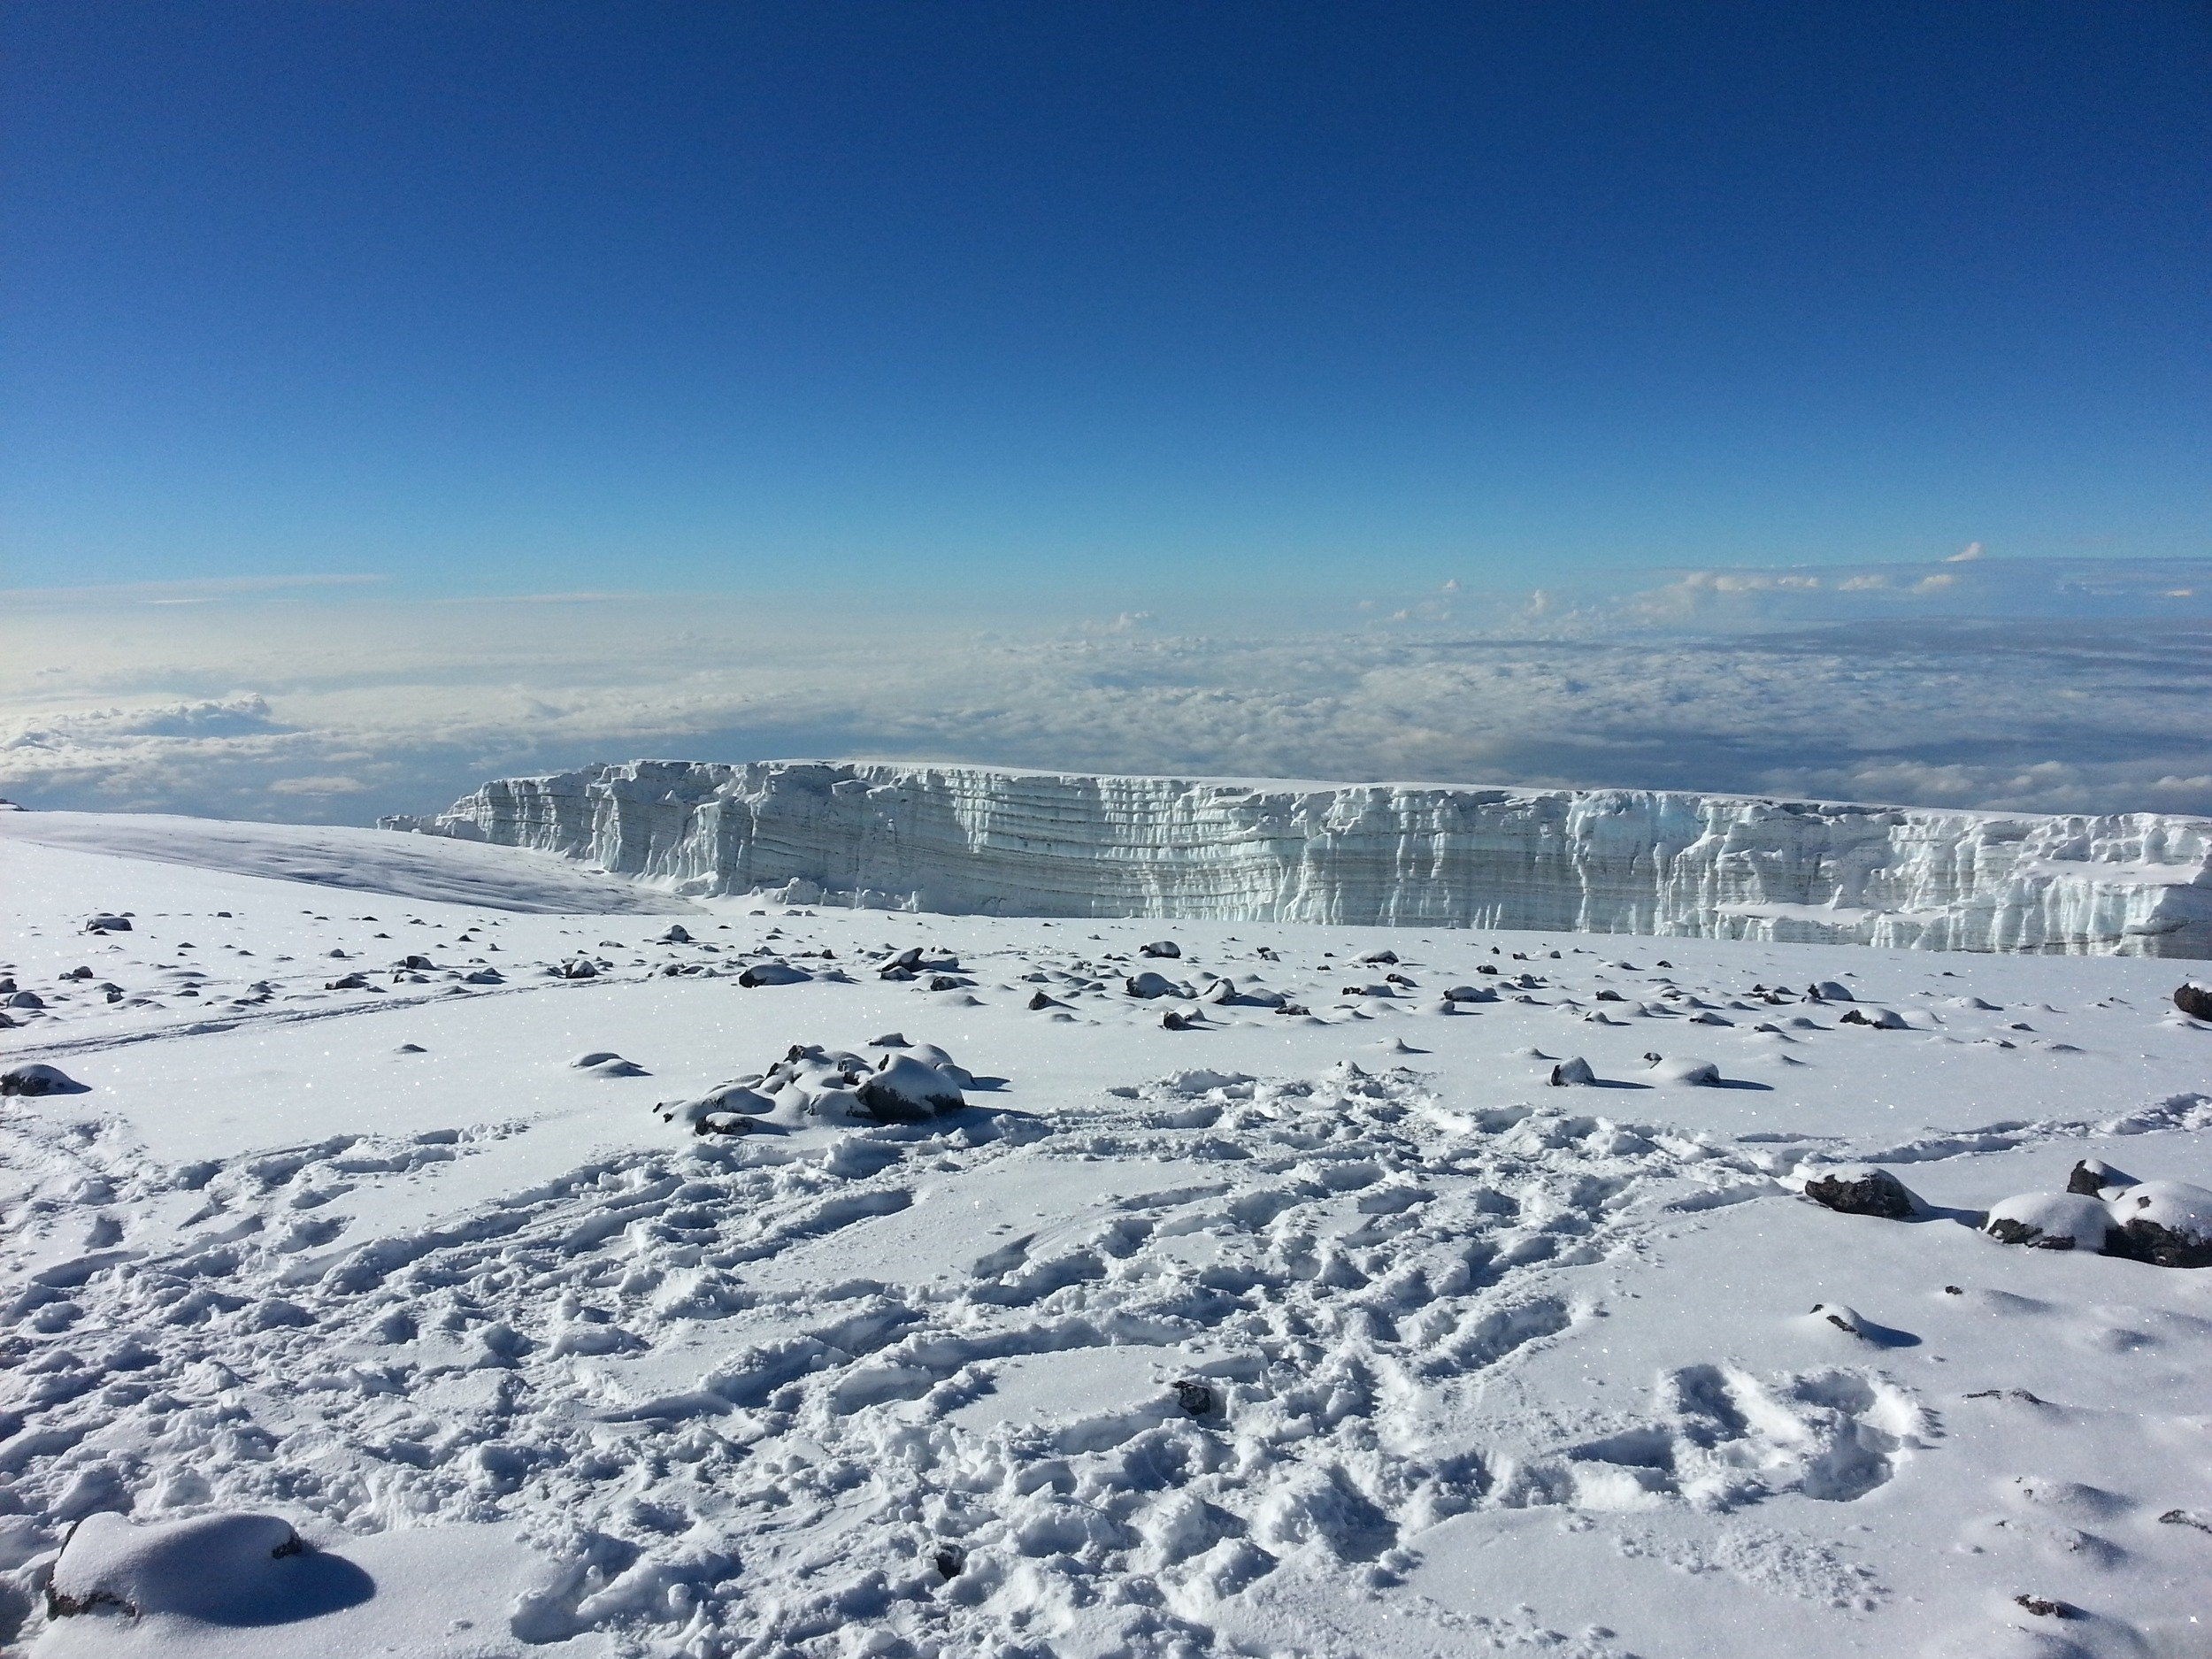 Glacier on Kilimanjaro, Africa – 19,340' (5896m)